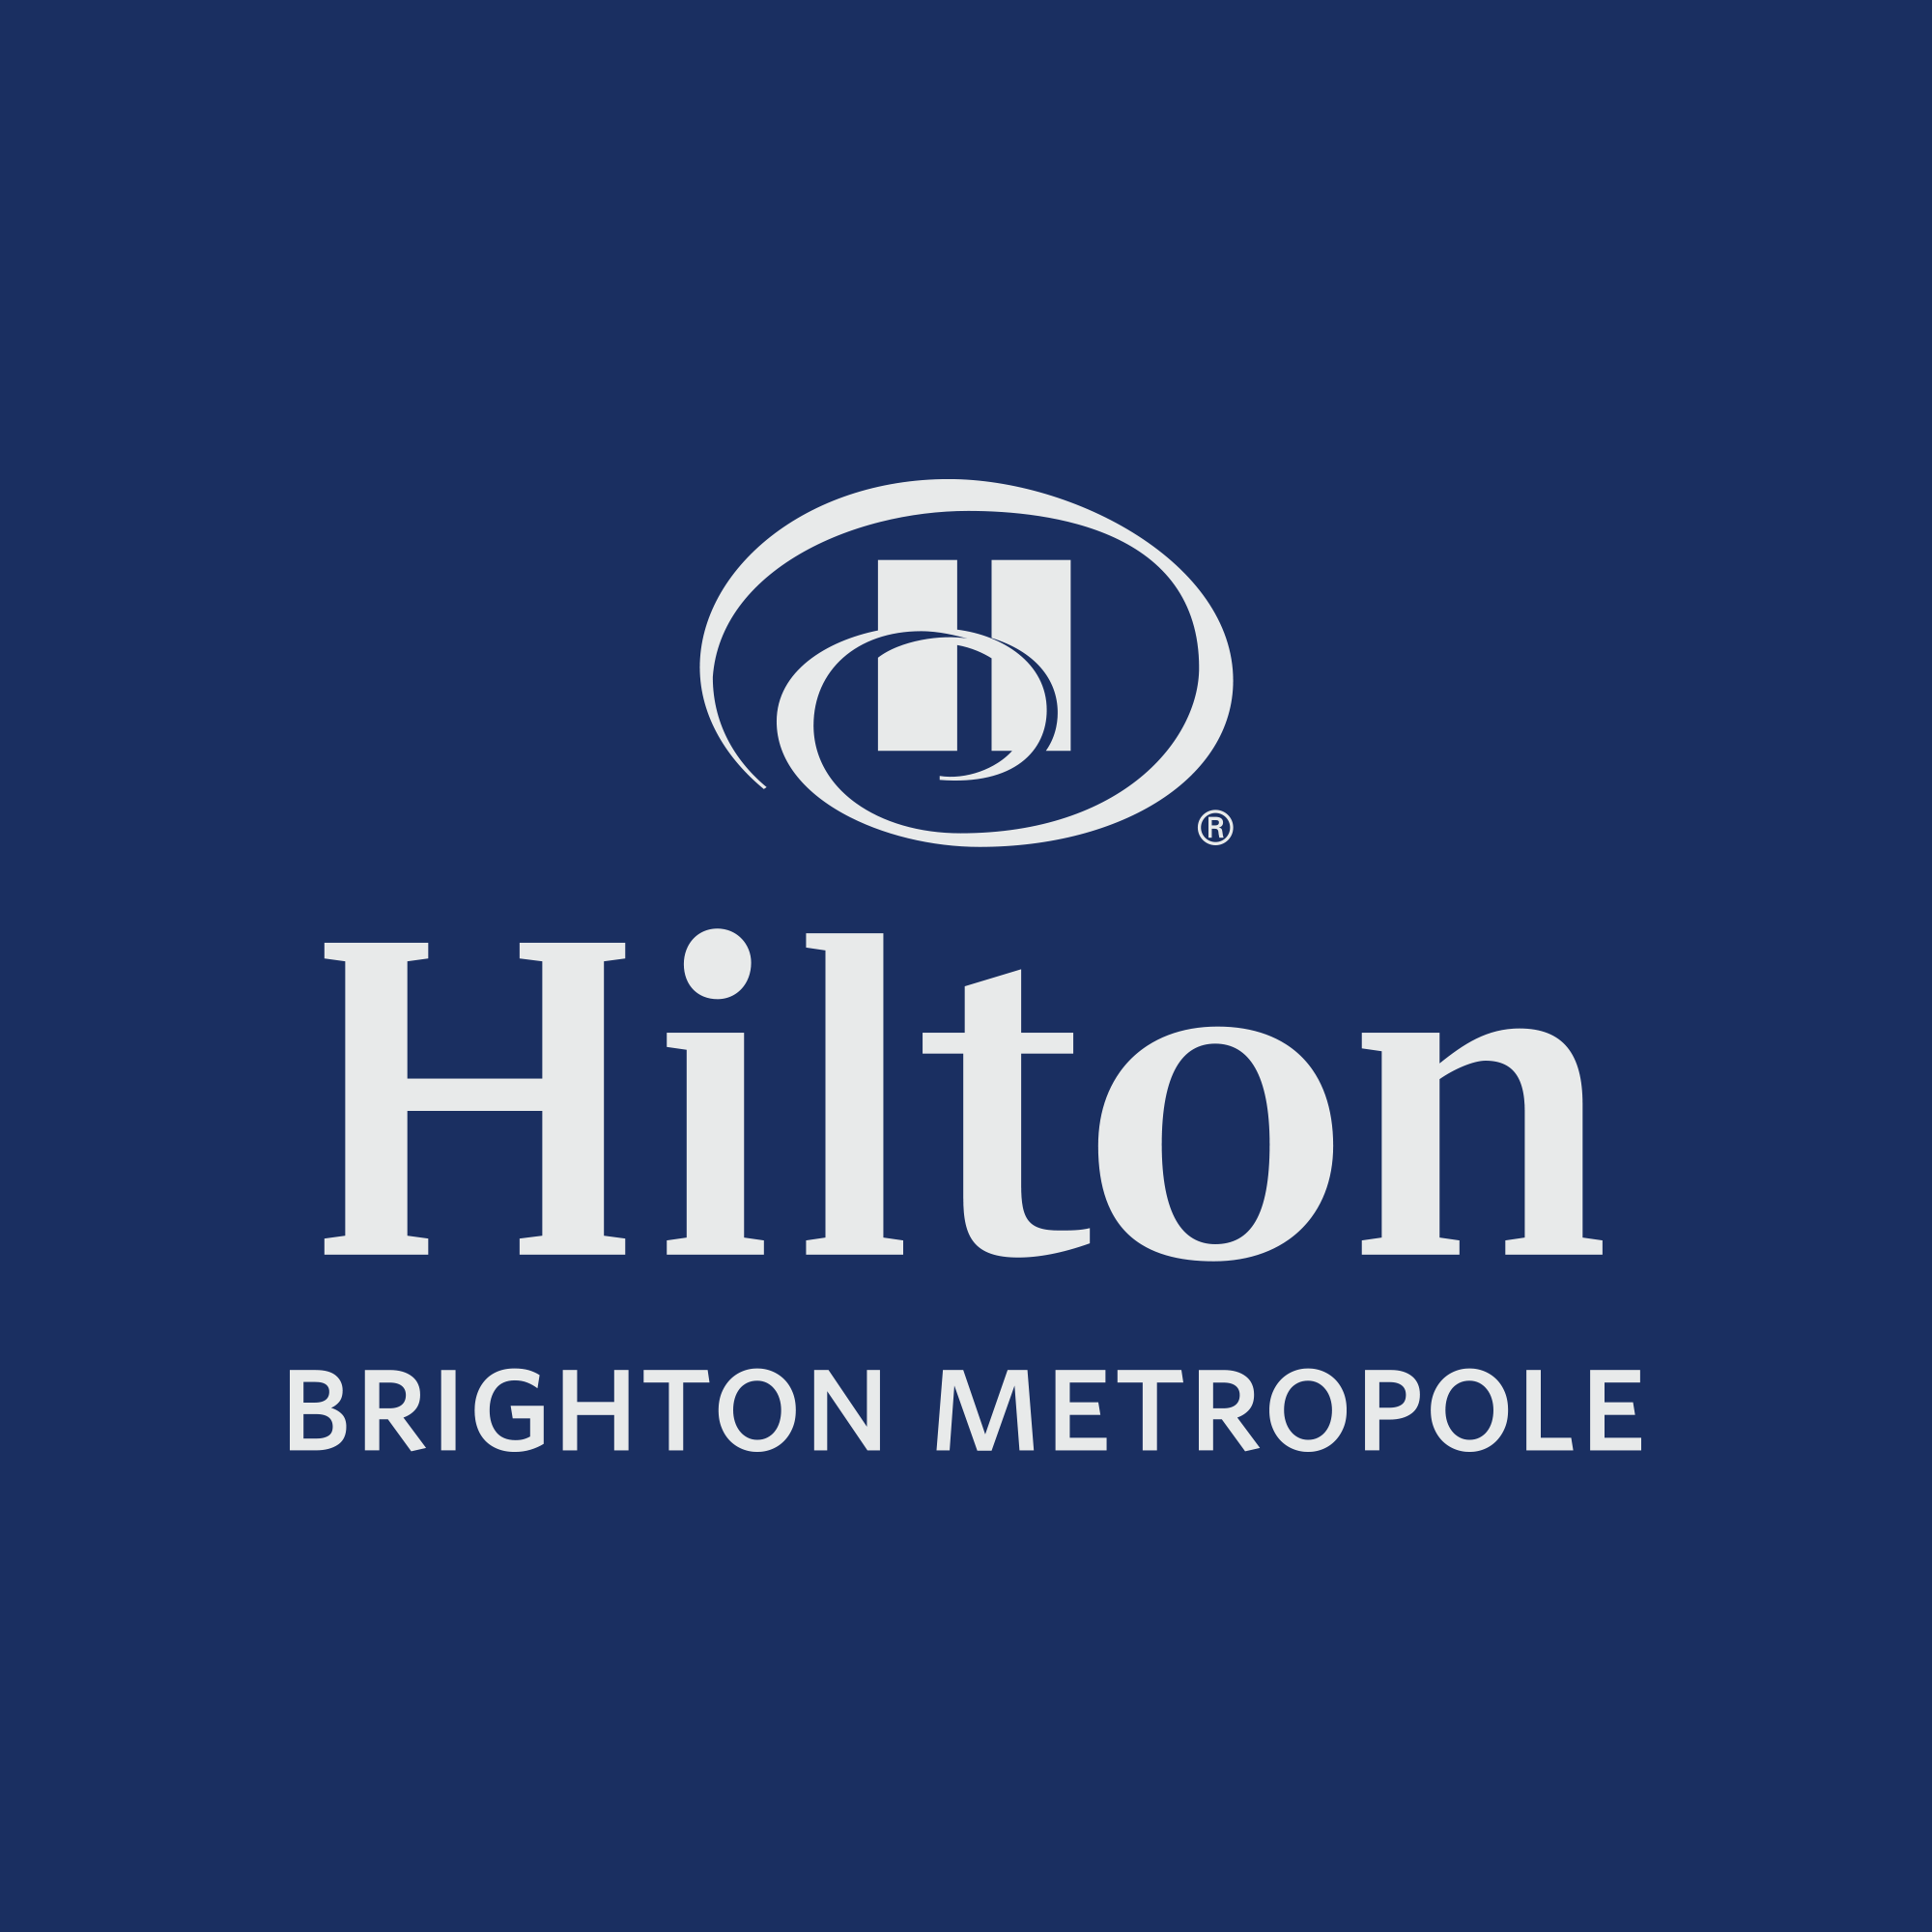 JatB - Hilton.png